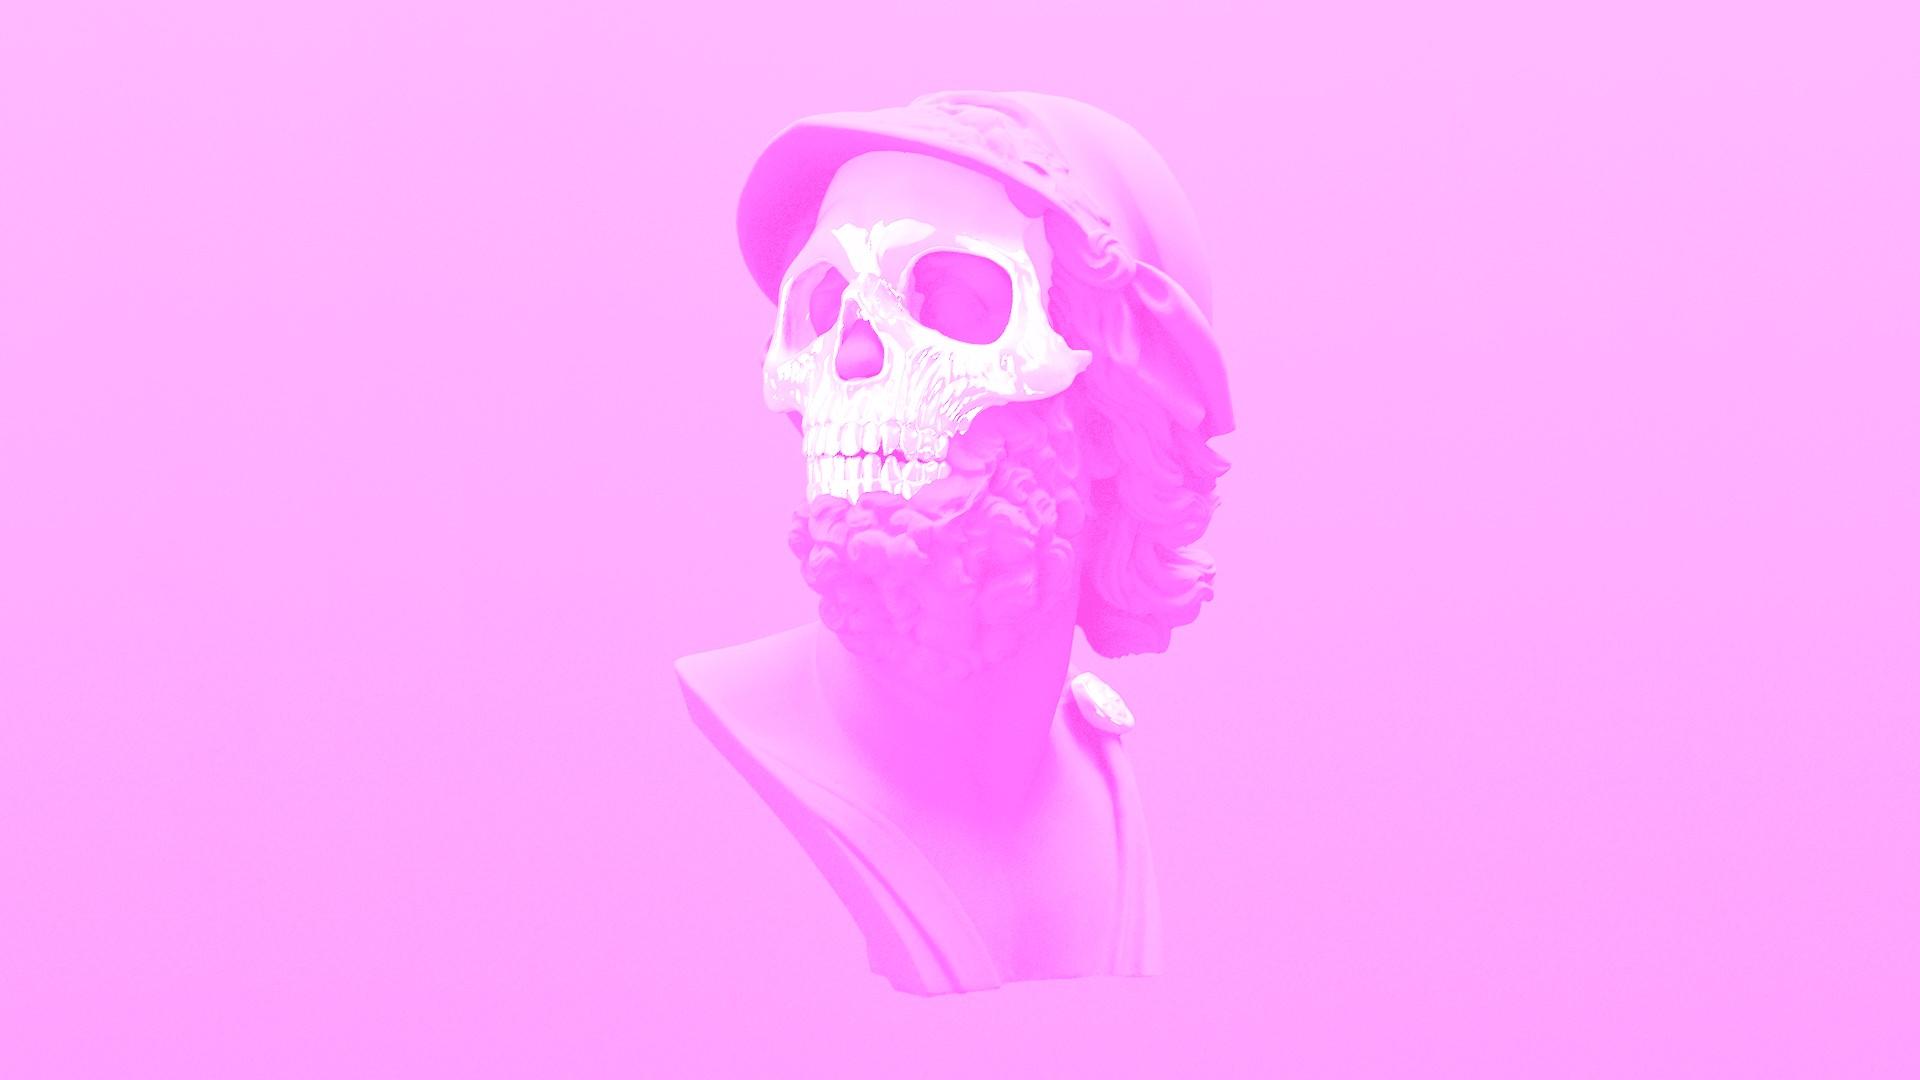 wallpaper 1920x1080 px pink skeleton skull vaporwave 1920x1080